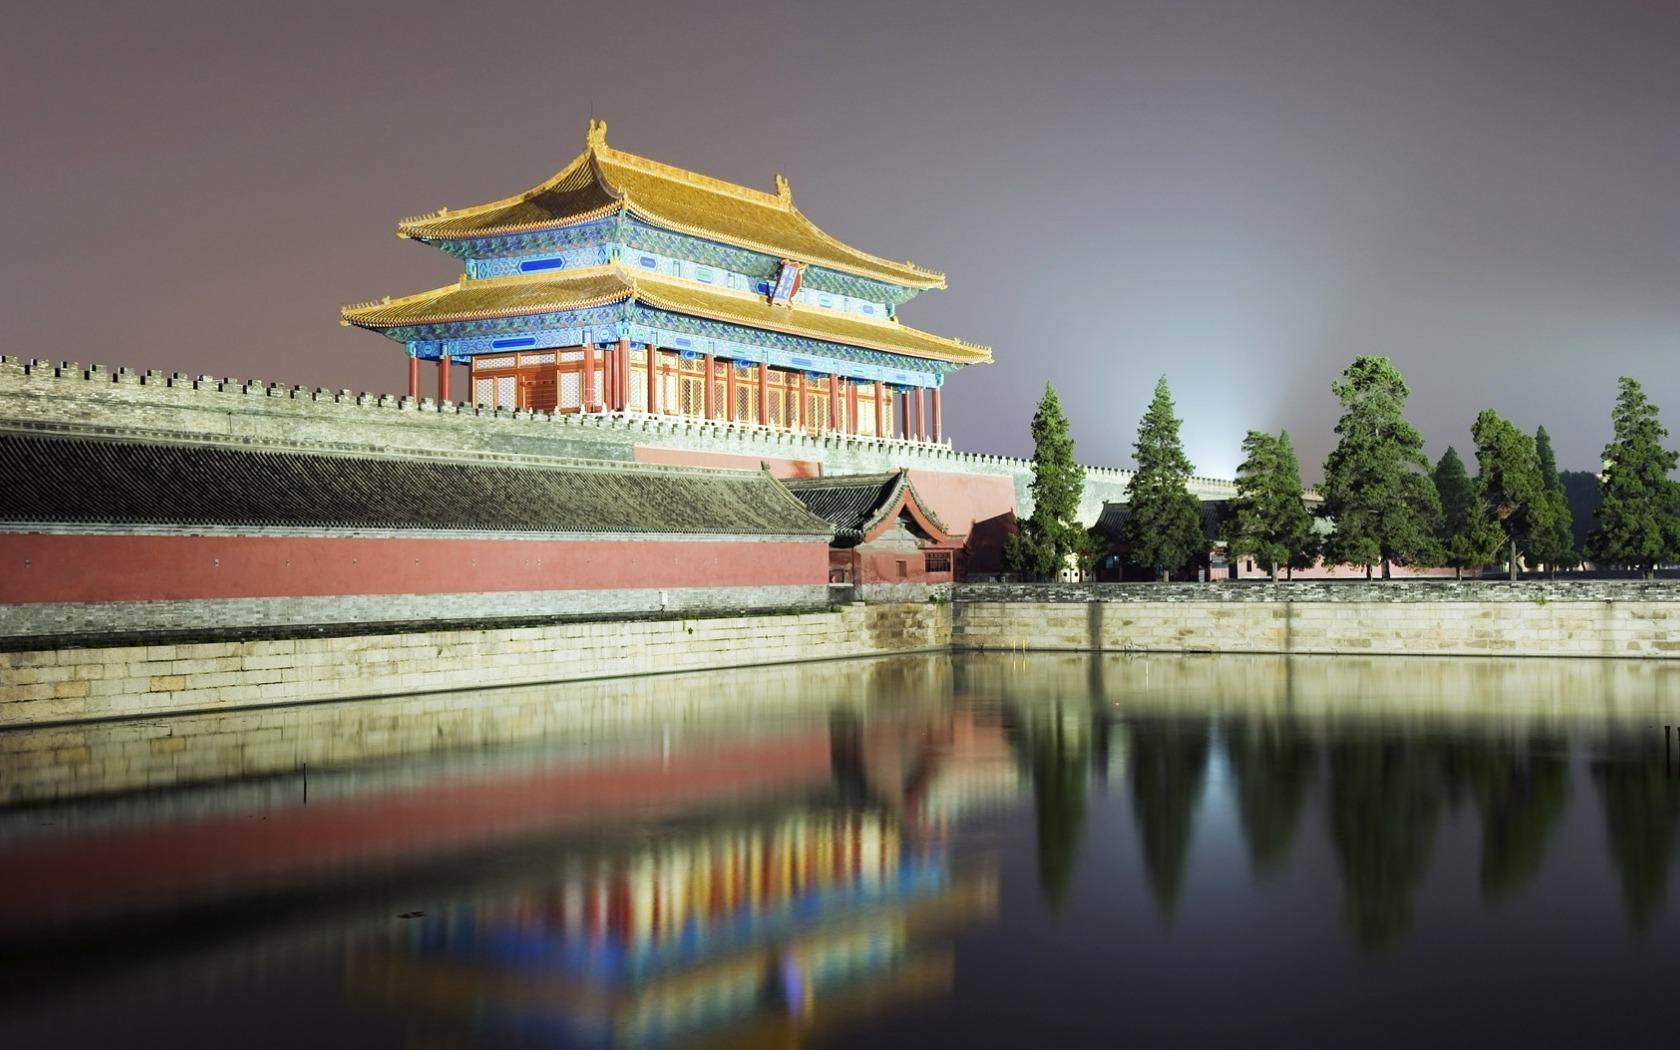 Resultado de imagem para wallpaper palacio imperial de pequim